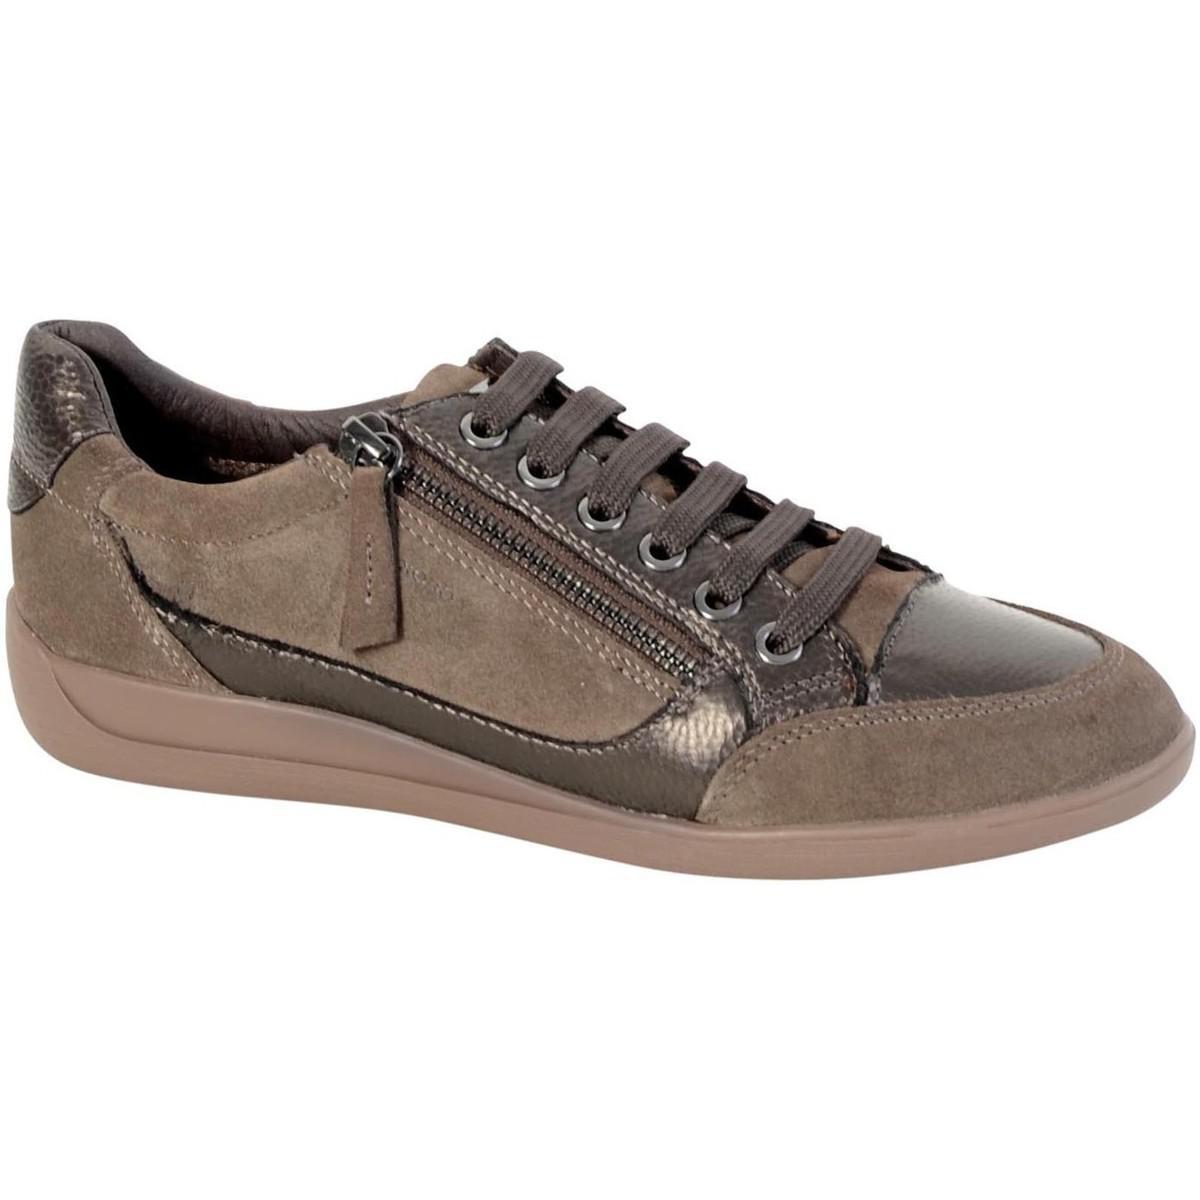 Geox Sneakers d Myria Has D6468a 022pv C6j1g Chestnutgun